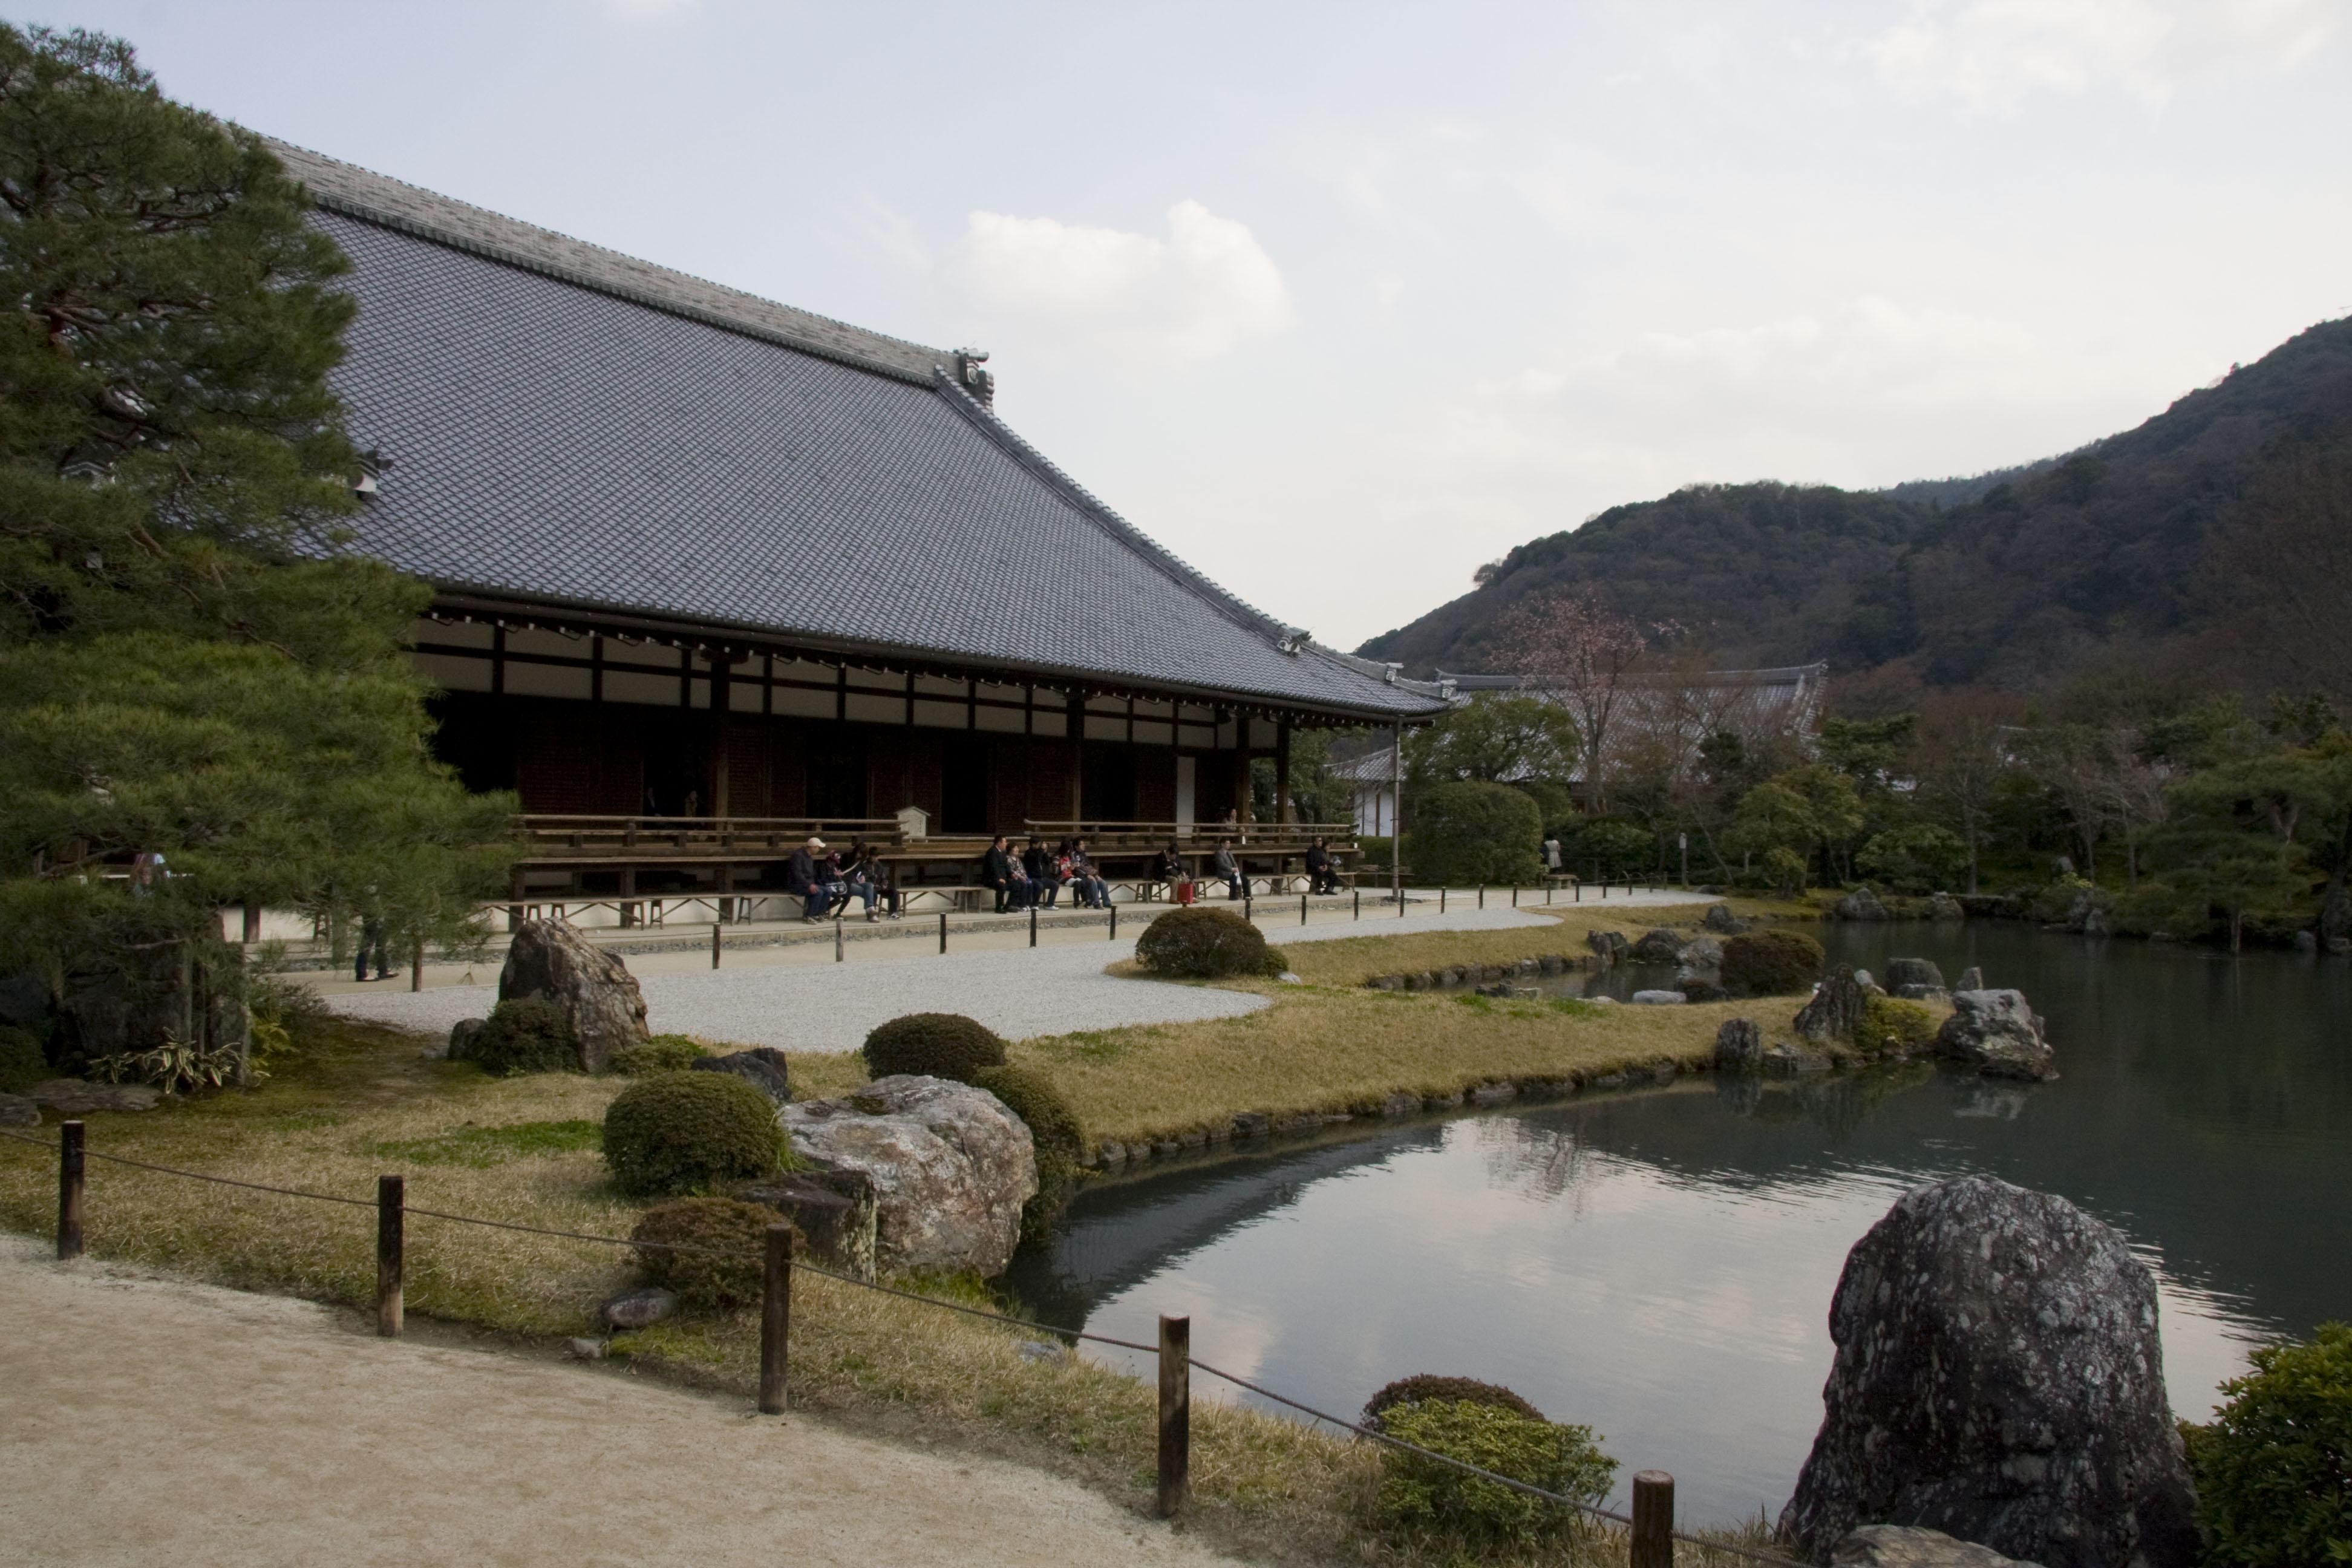 Asia, Japan, Honshu, Kyoto, Arashiyama, Tenryuji Temple, Tenryuji ...